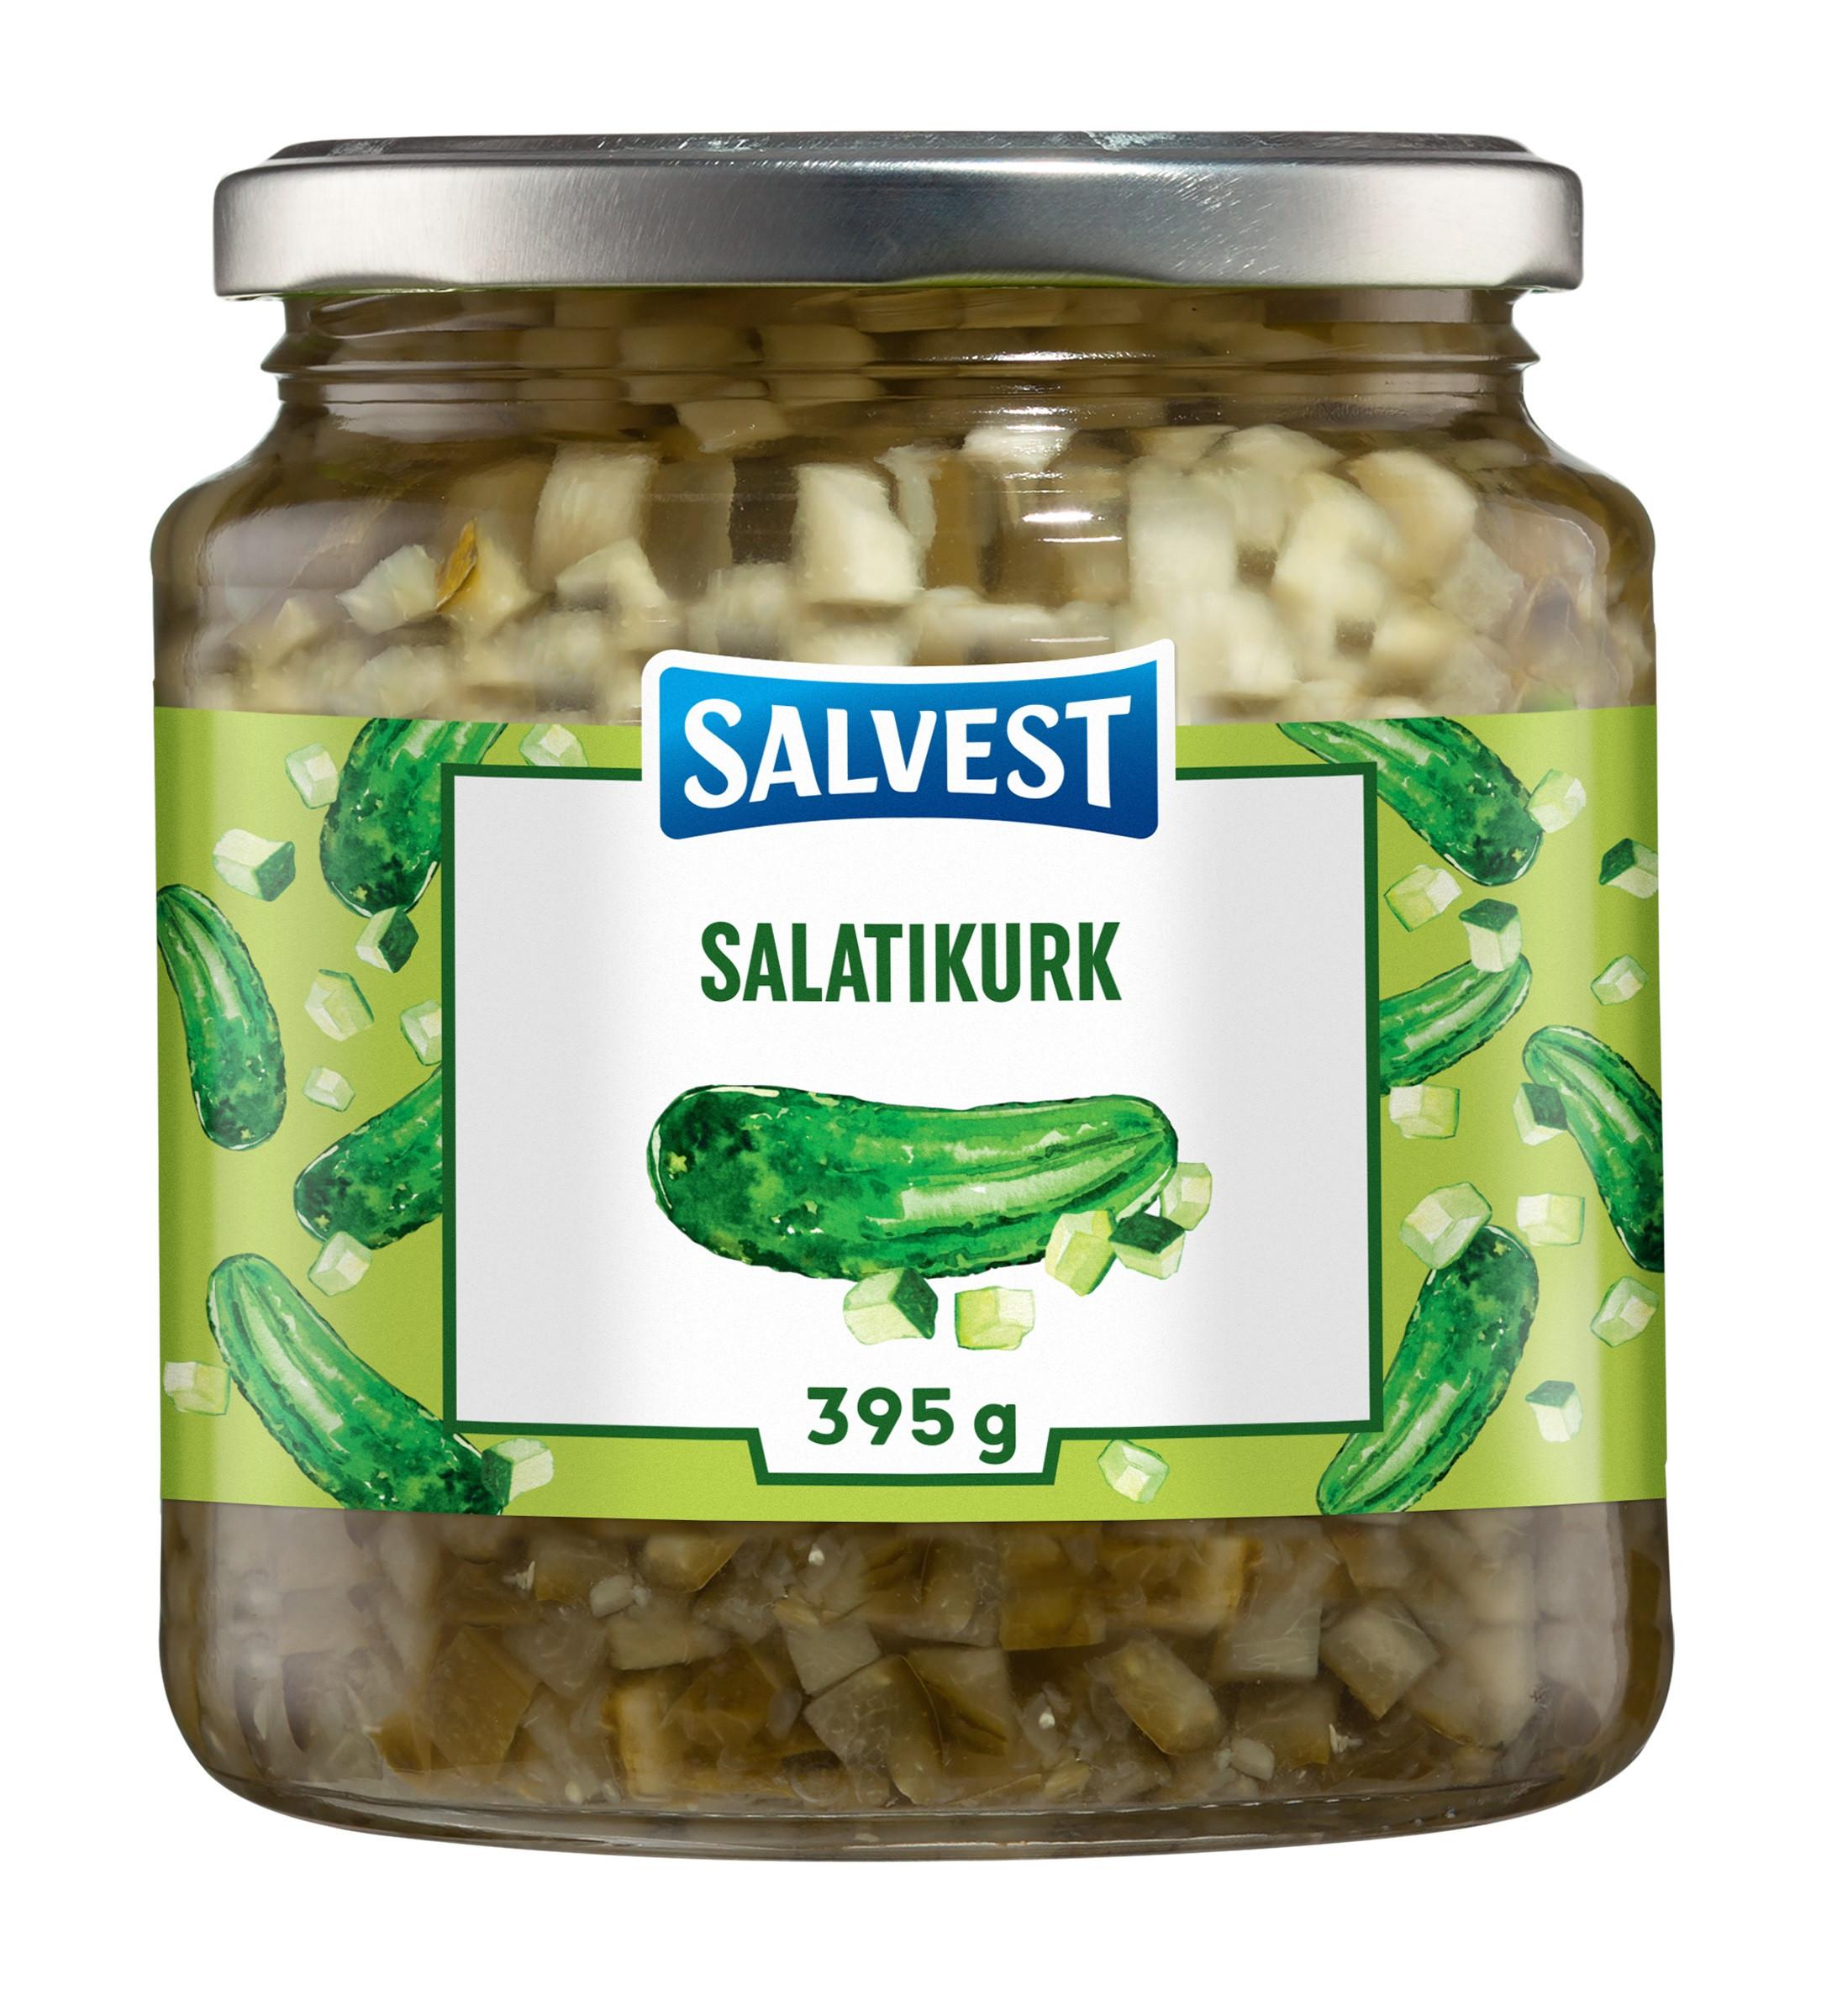 Kurk salati (kuubikud) 395g SALVEST